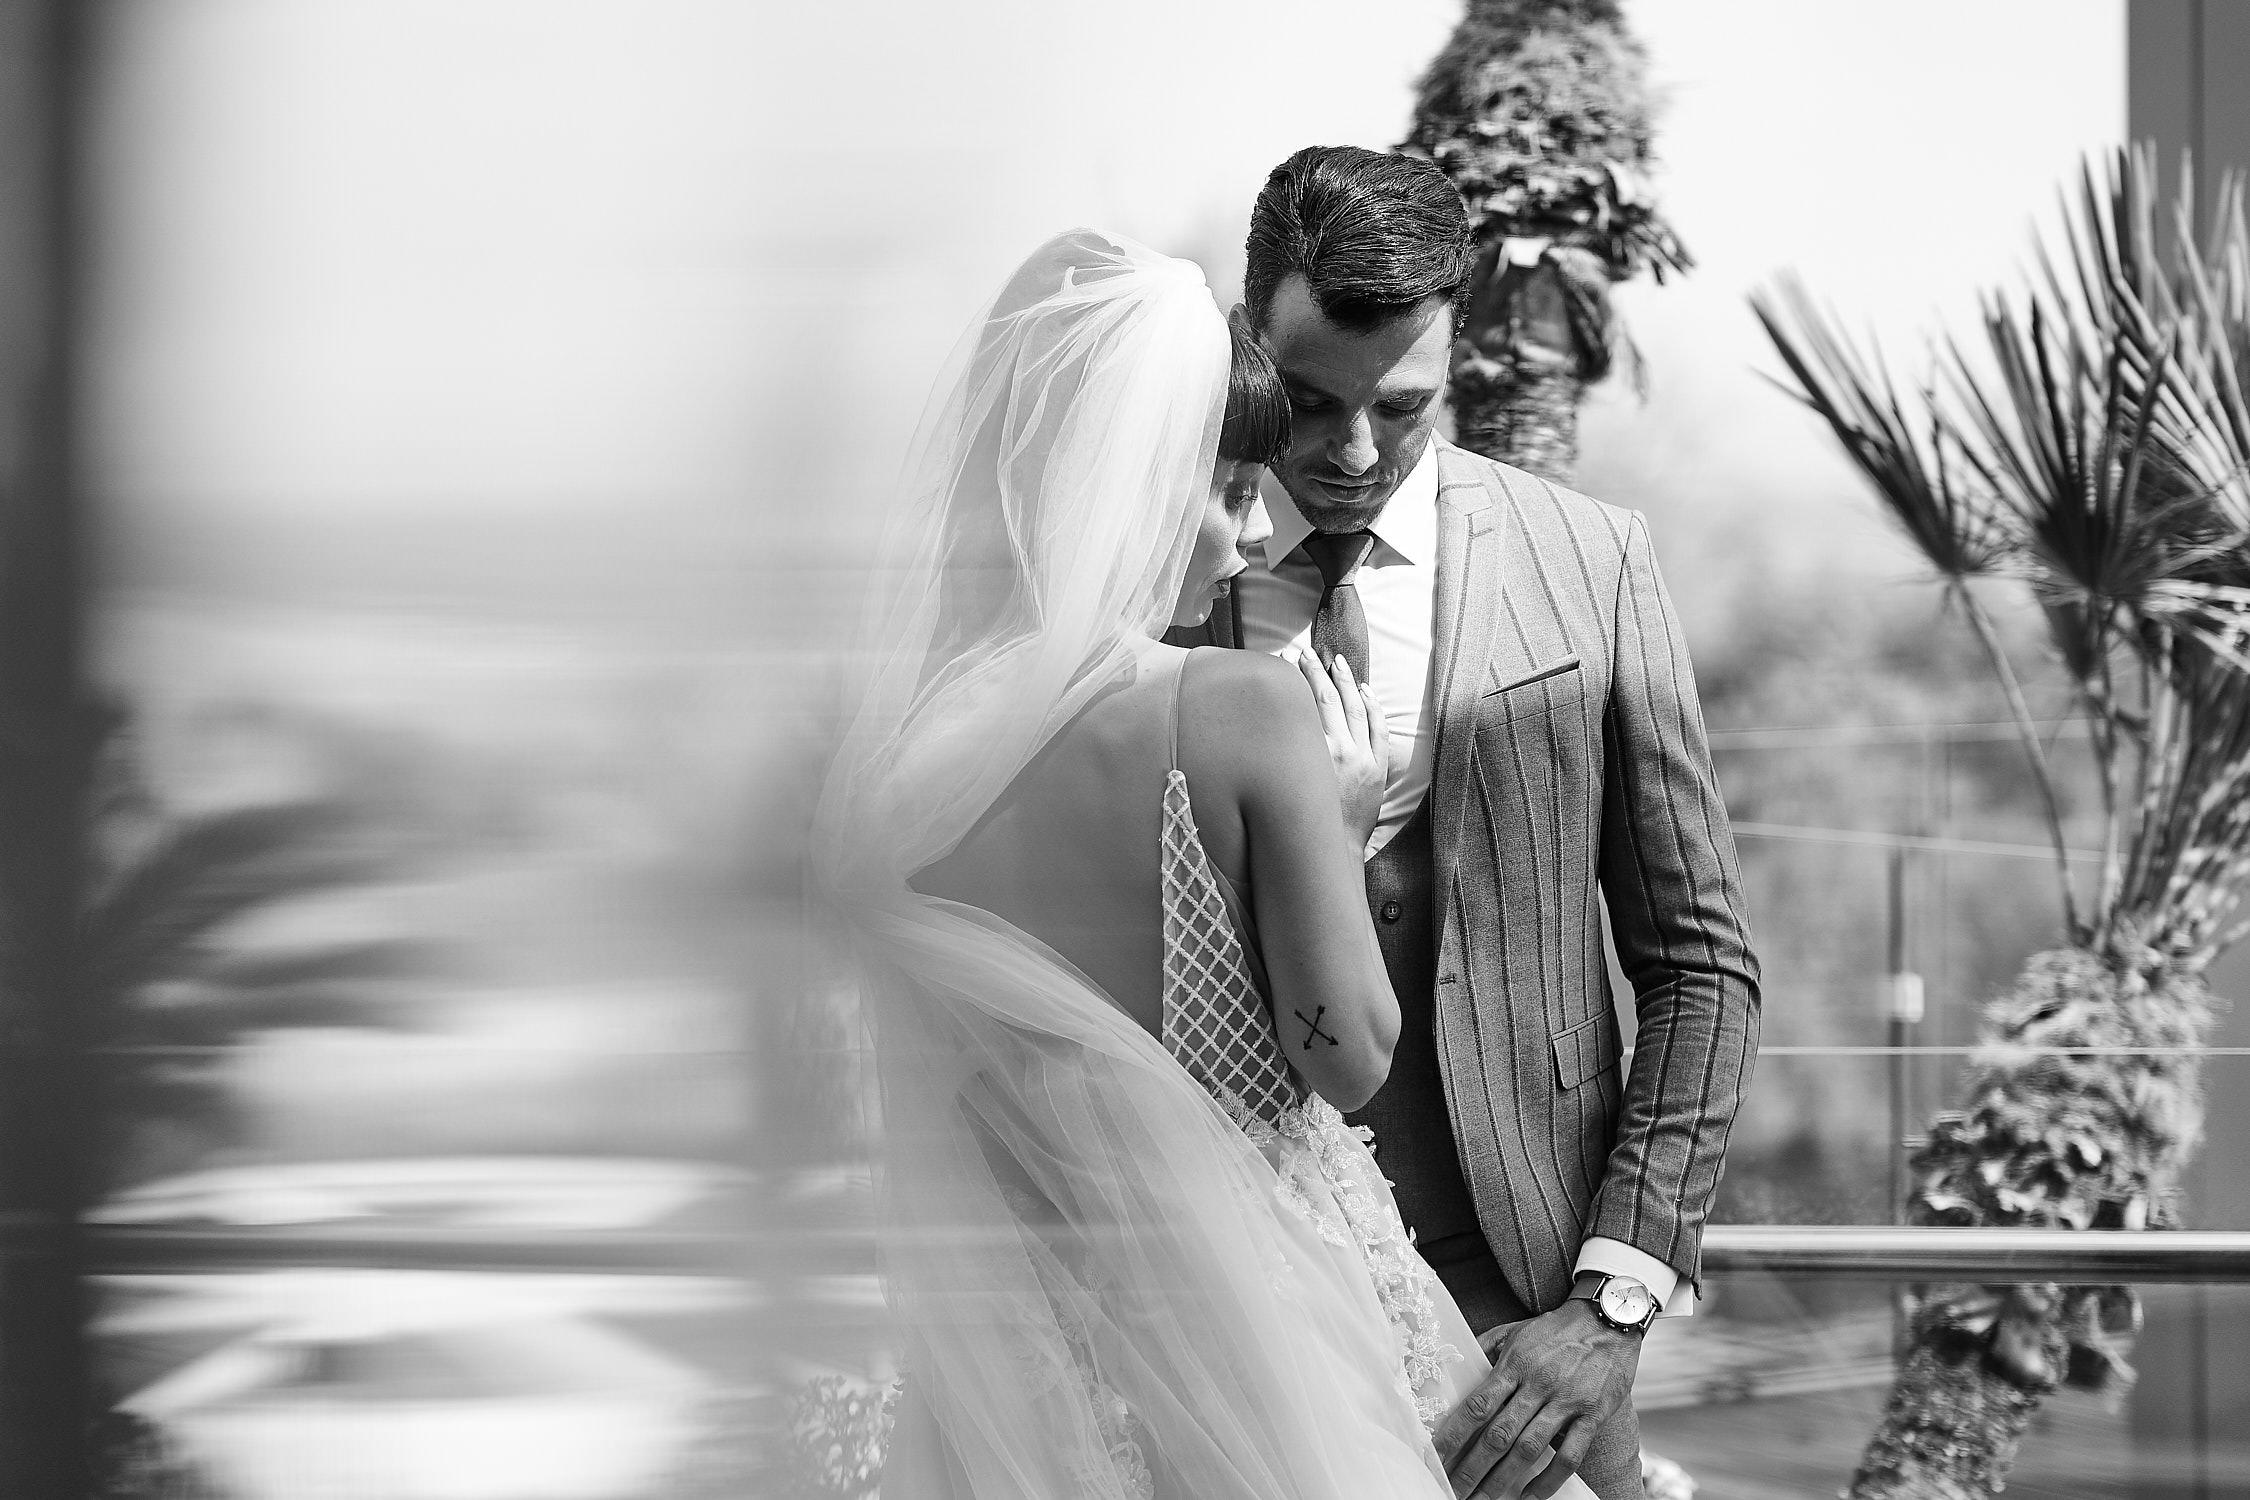 Wedding Photography by Alin Popescu - Jönköping wedding photographer